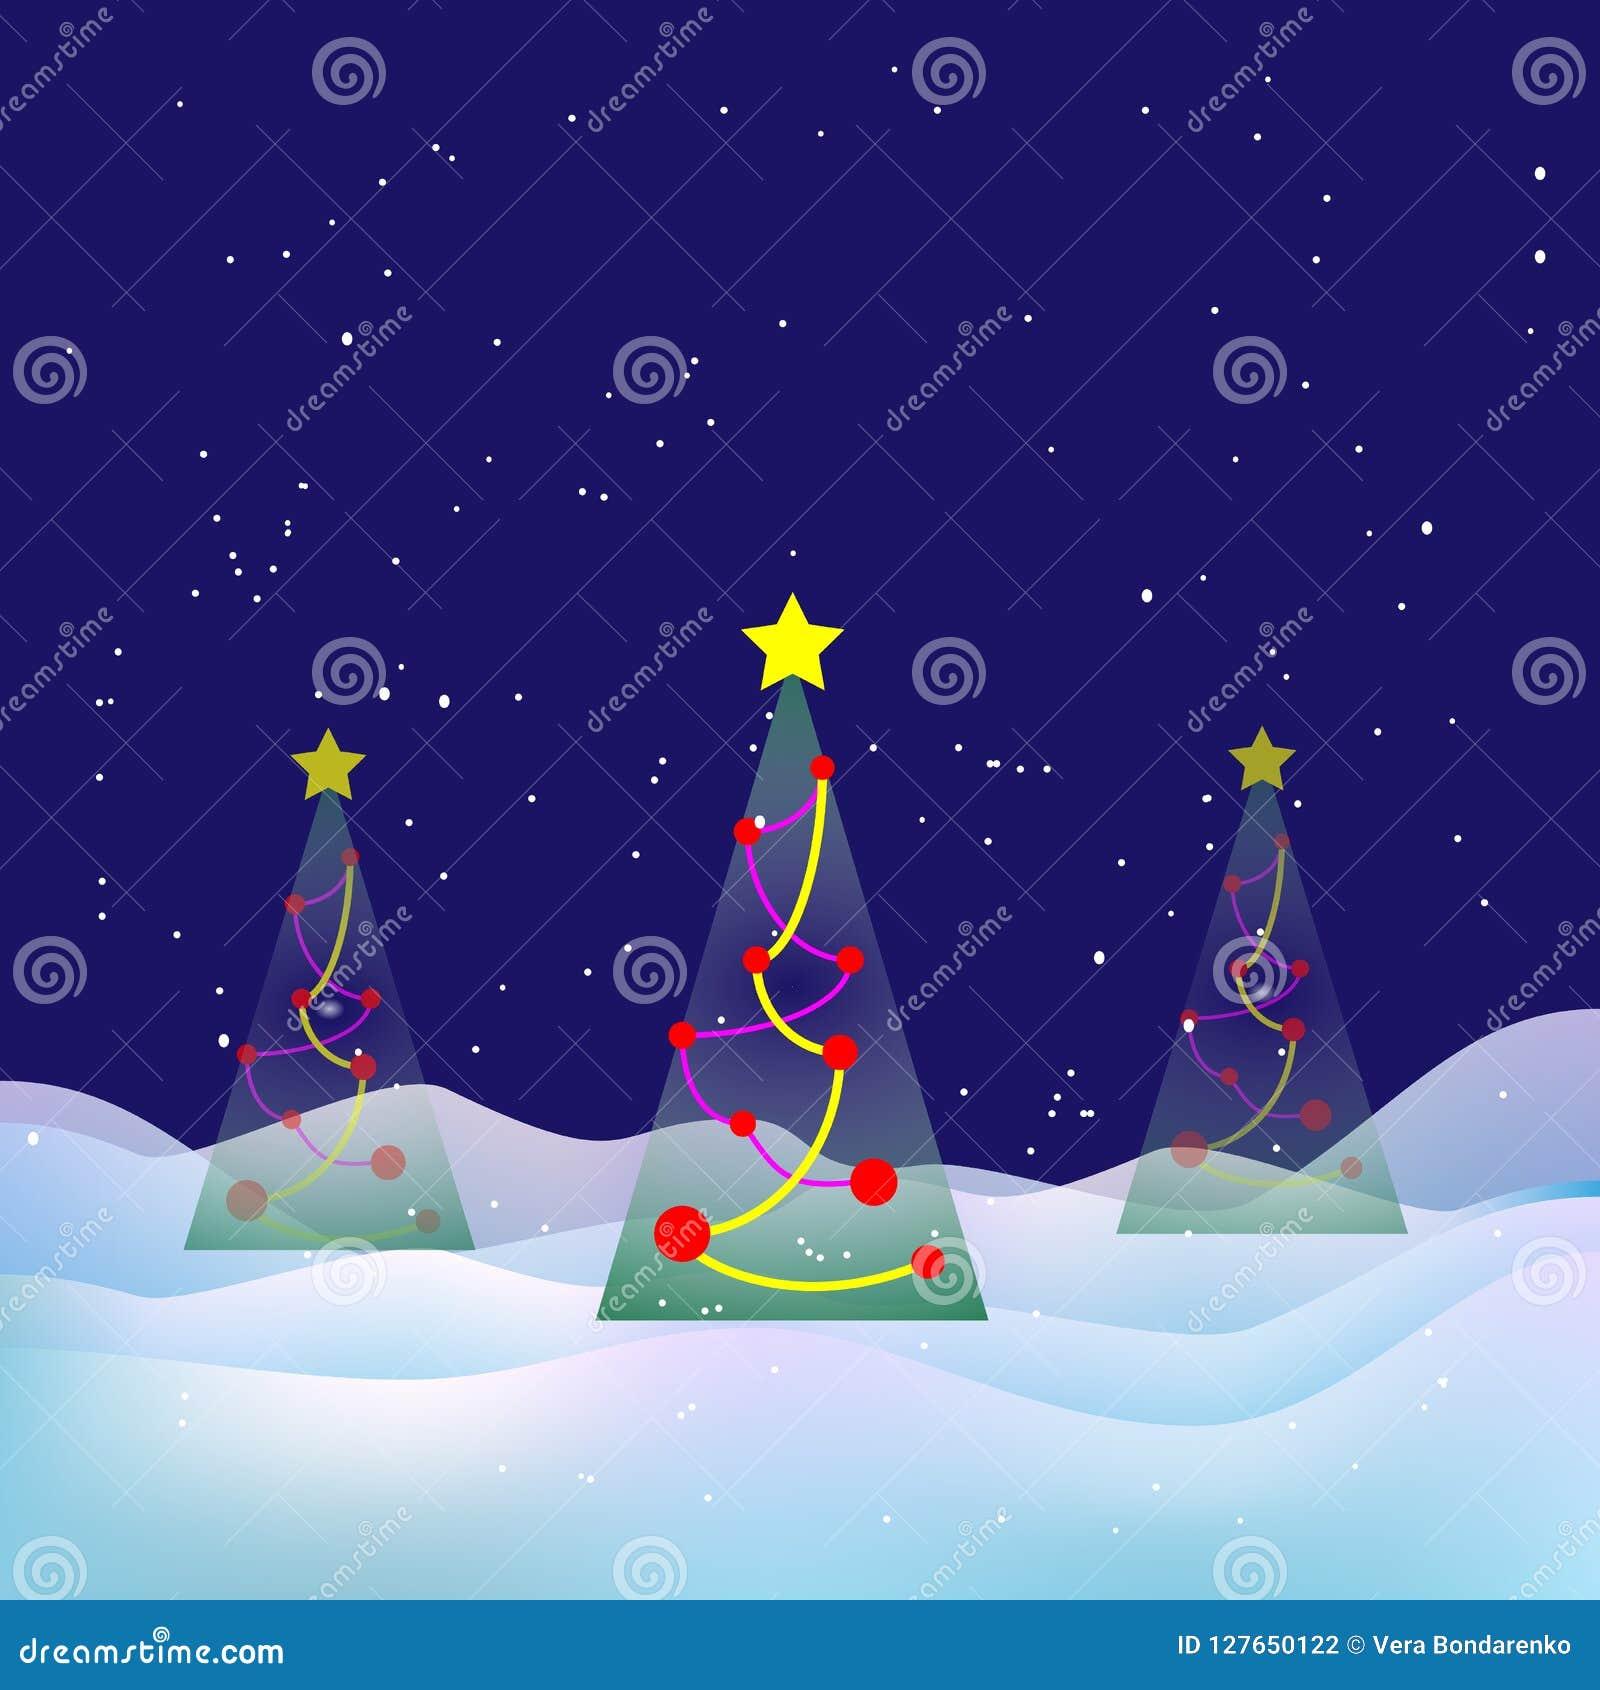 Winter Christmas landscape. Snowy night, Xmas tree